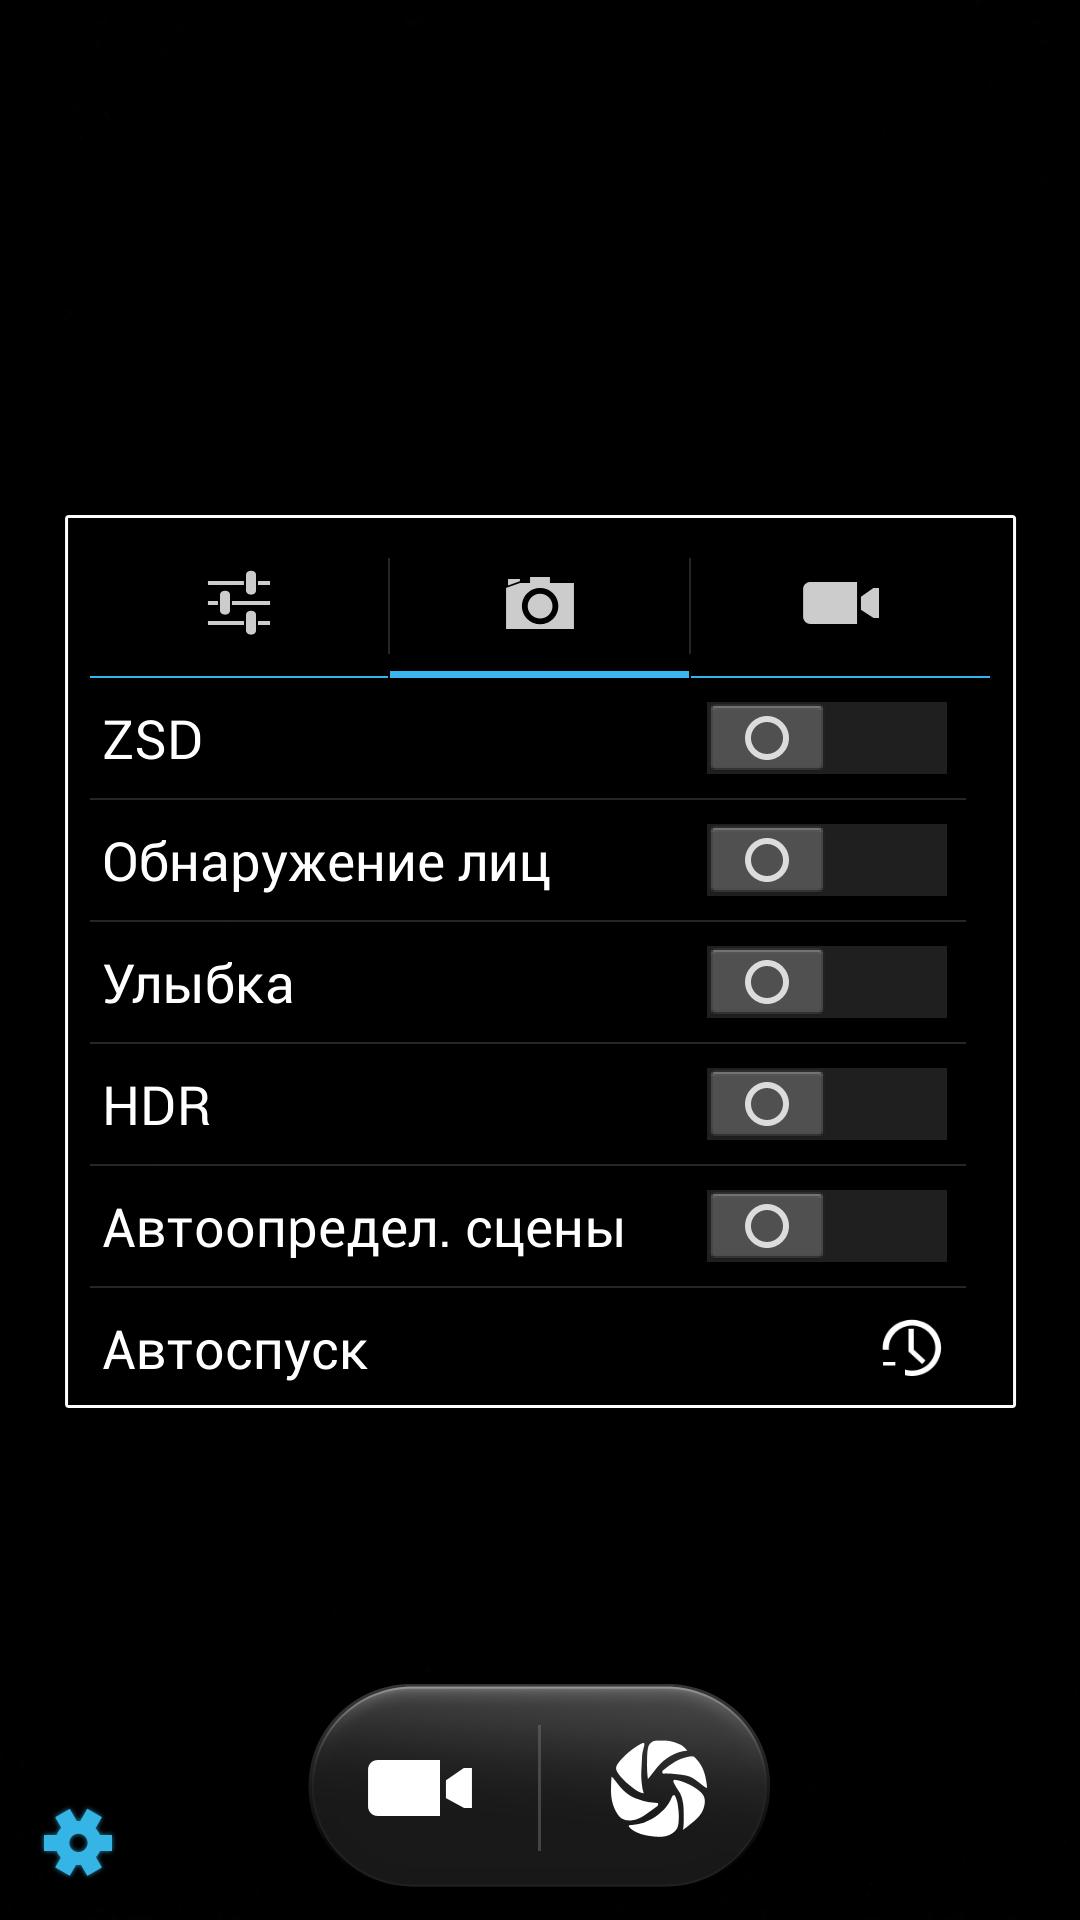 Screenshot_2014-07-11-19-59-49